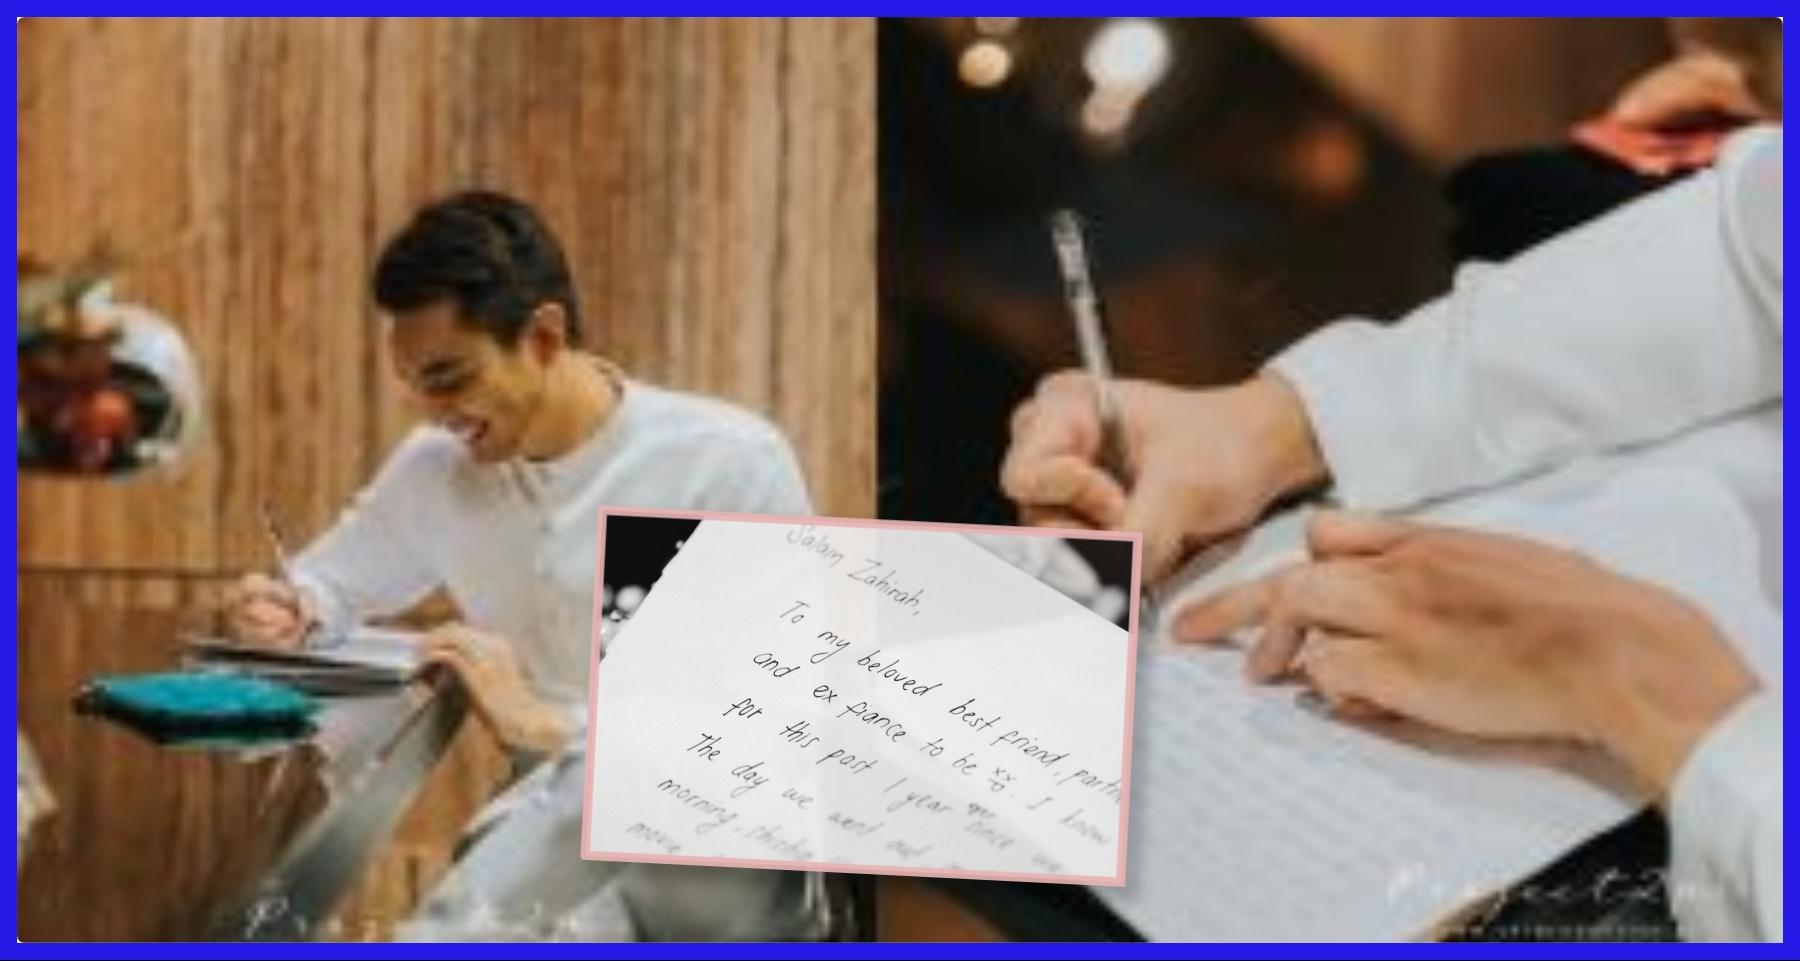 Tulis Surat Cinta Sebelum Nikah, Tlndakan 'Sweet' Aiman ...